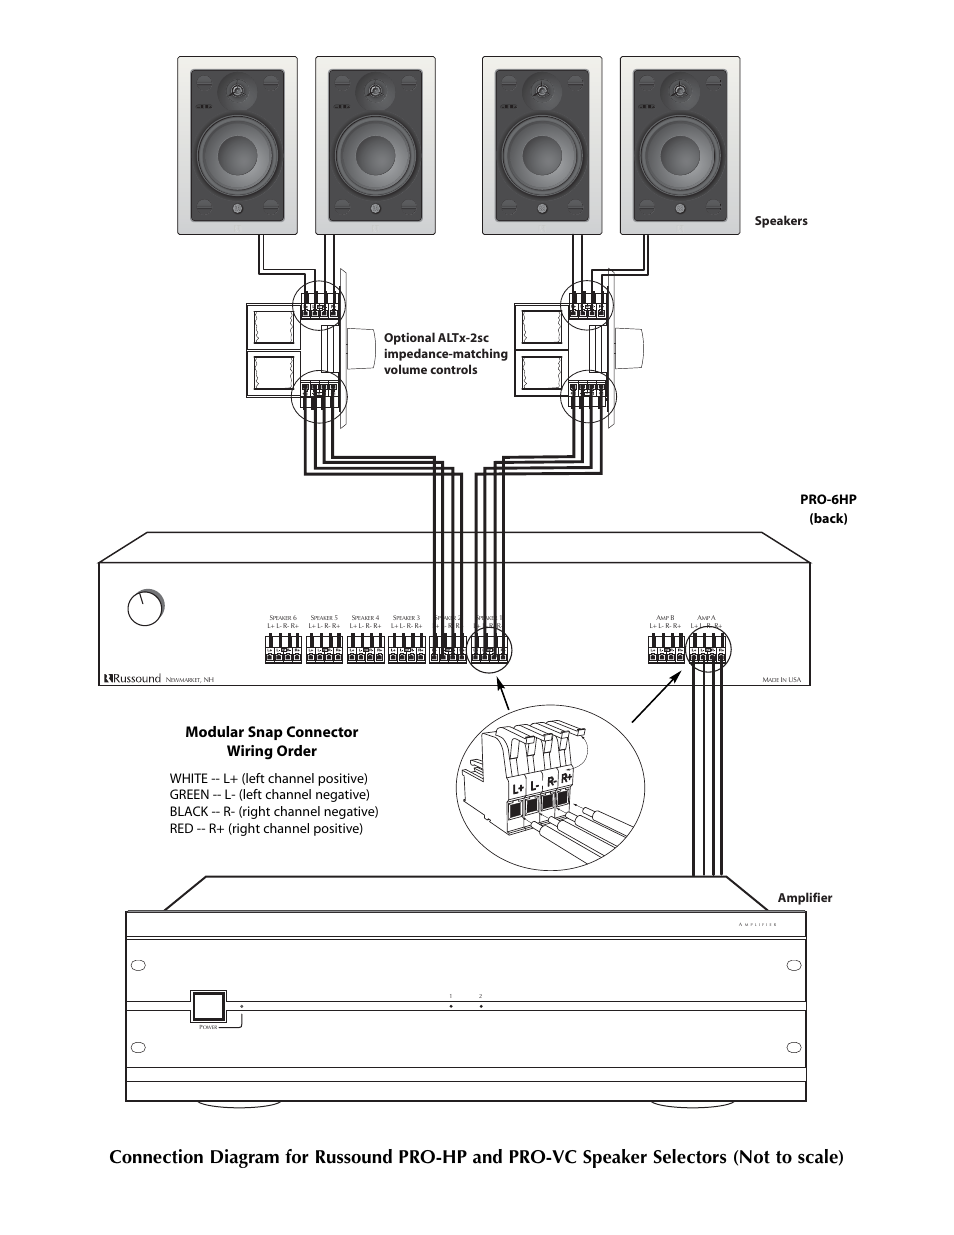 russound wiring diagram private sharing about wiring diagram u2022 rh caraccessoriesandsoftware co uk